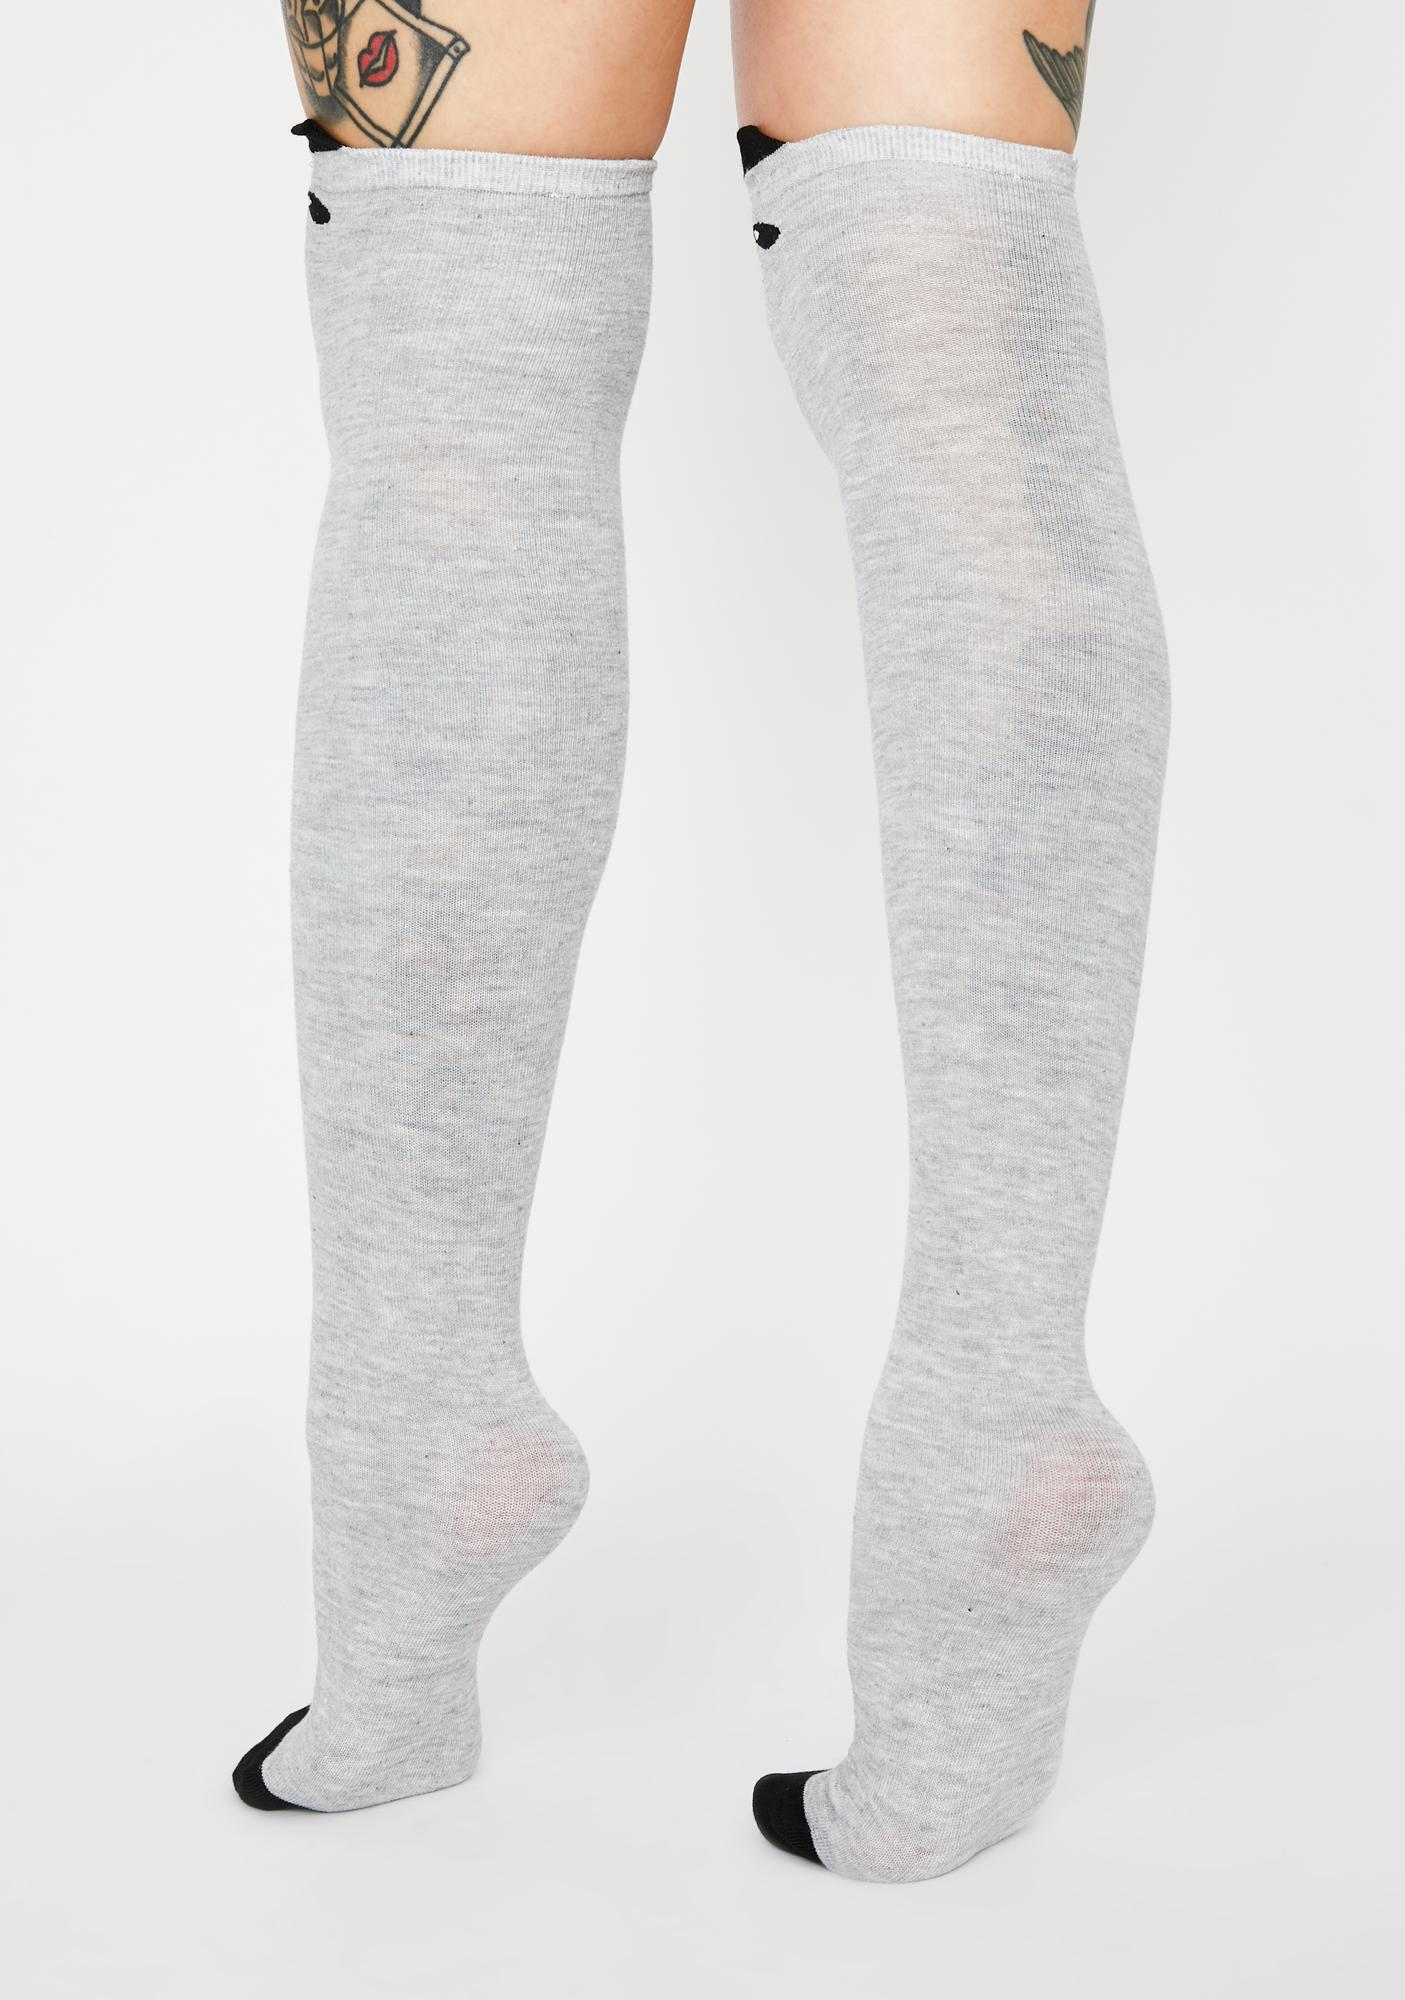 Ash Are U Kitten Me Thigh High Socks